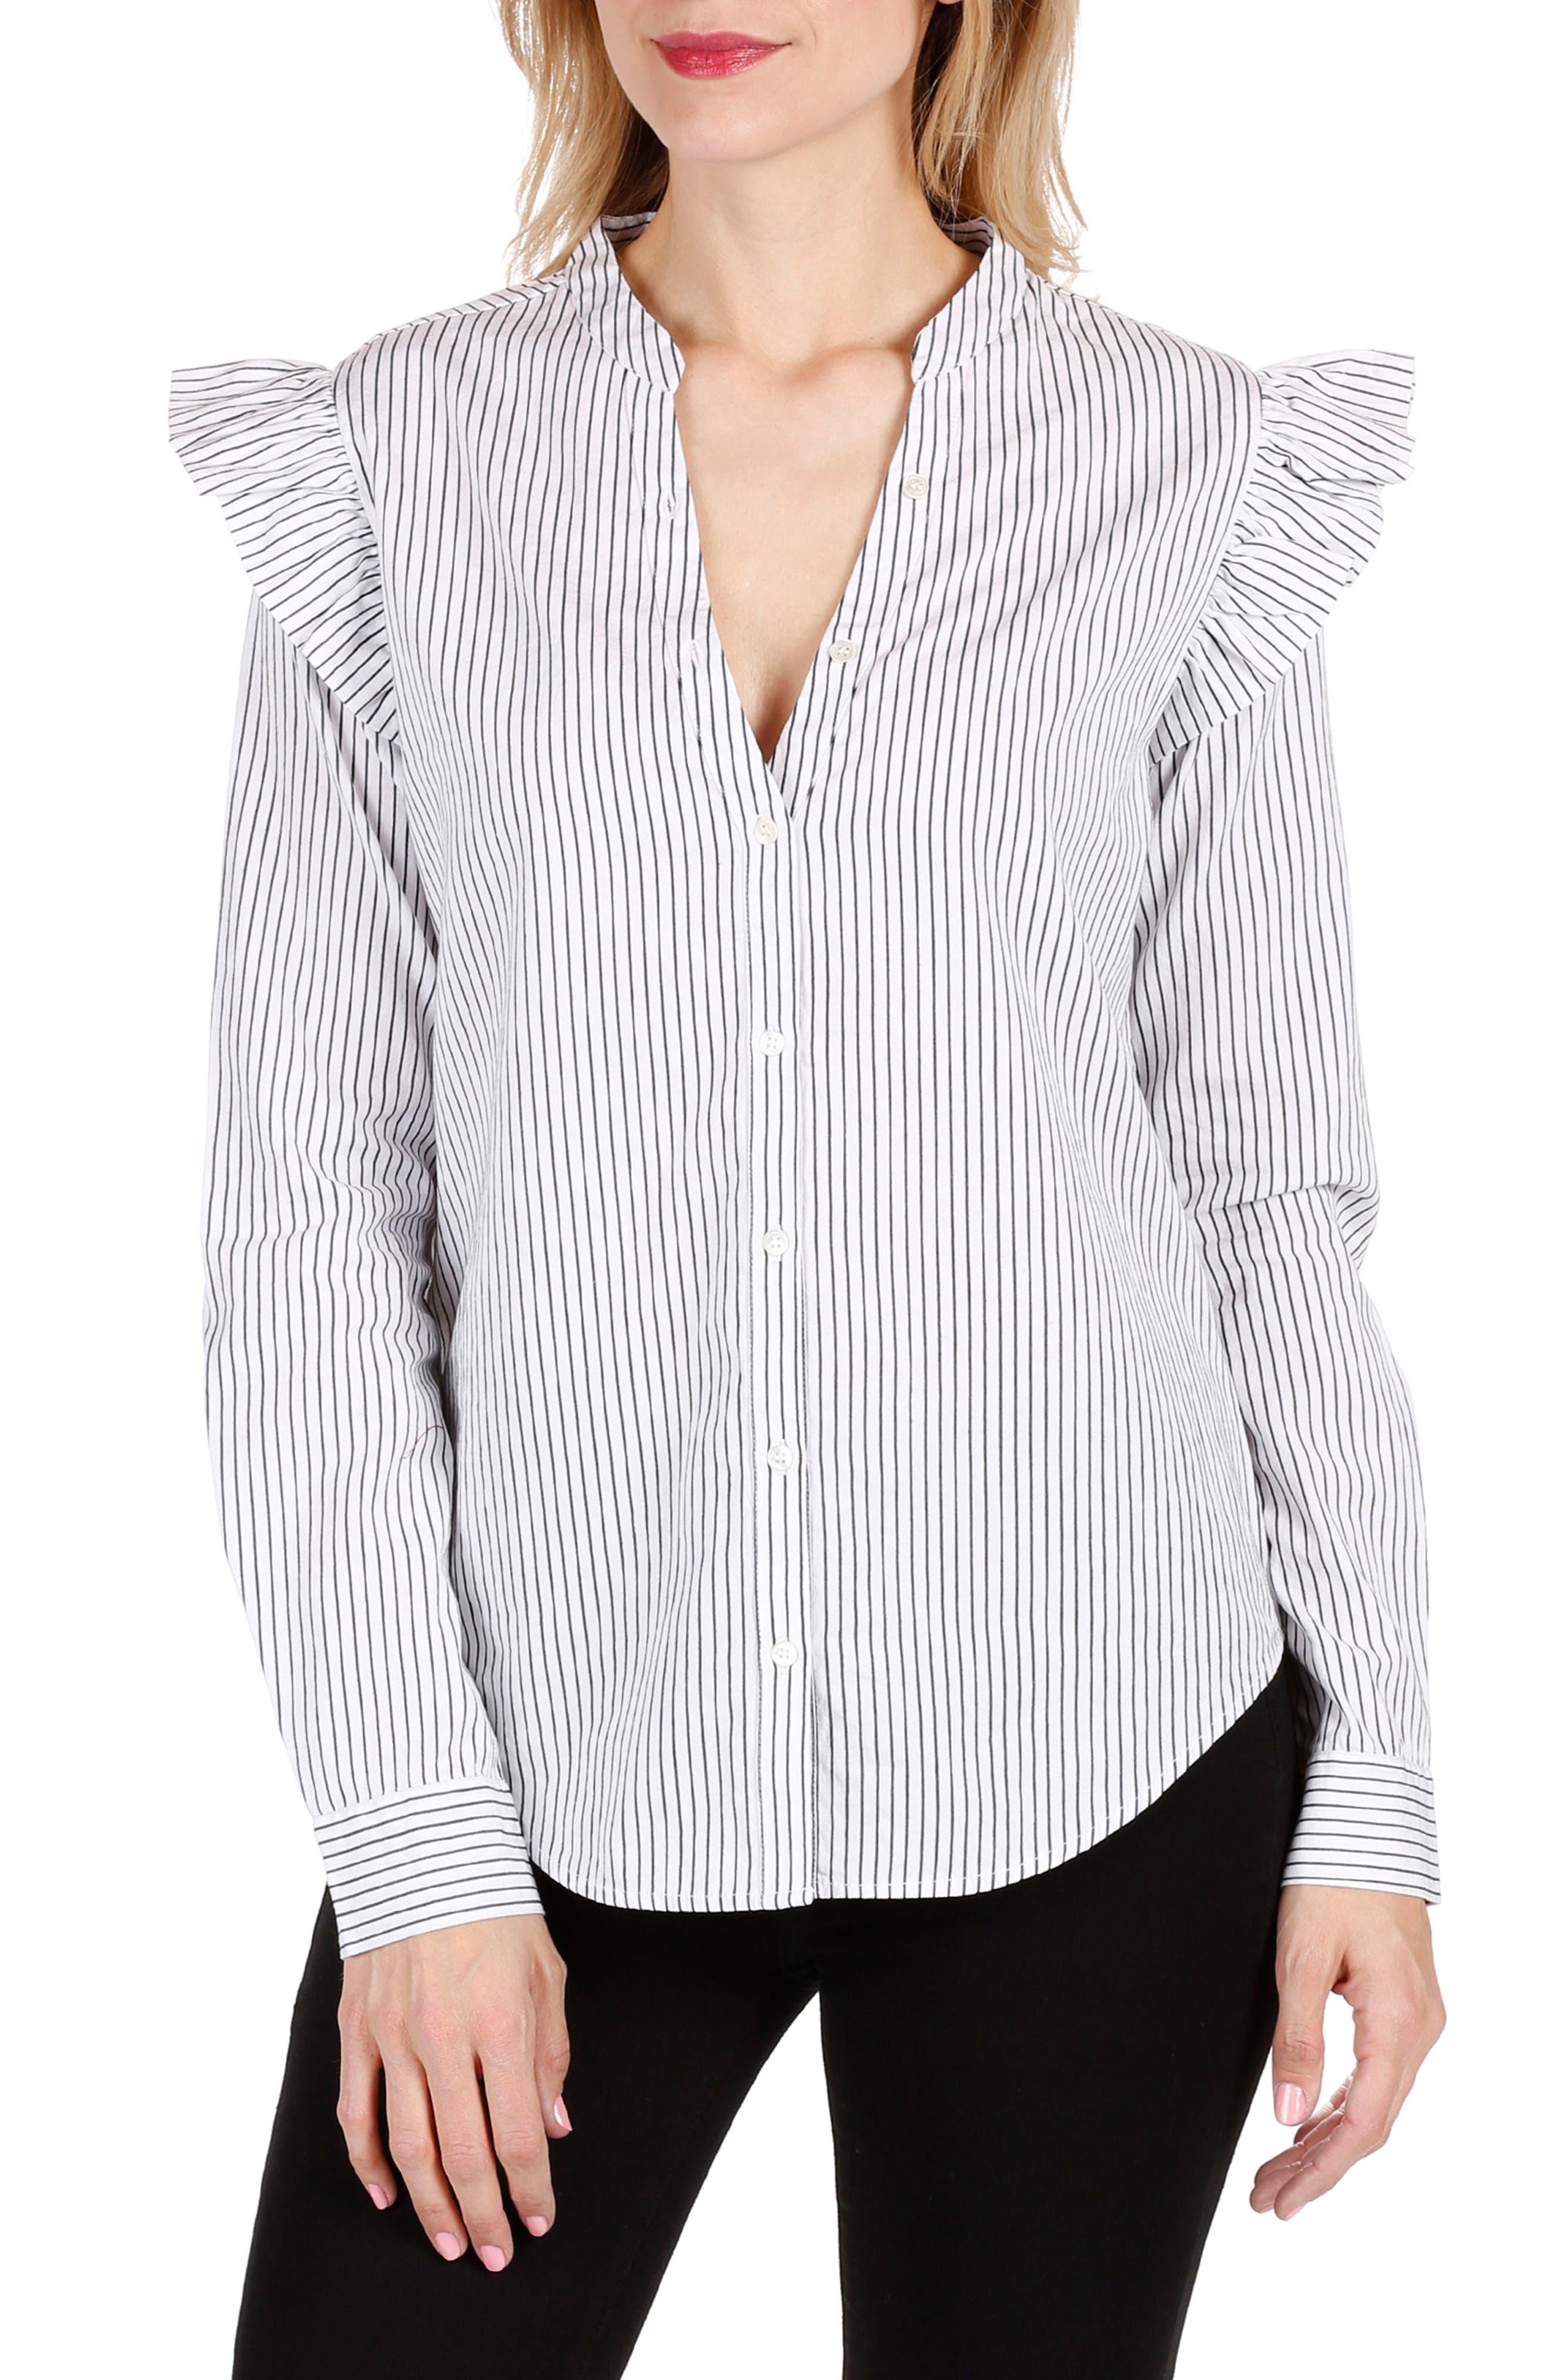 Jenelle Ruffle Dress Shirt,                         Main,                         color, Black/ White Stripe